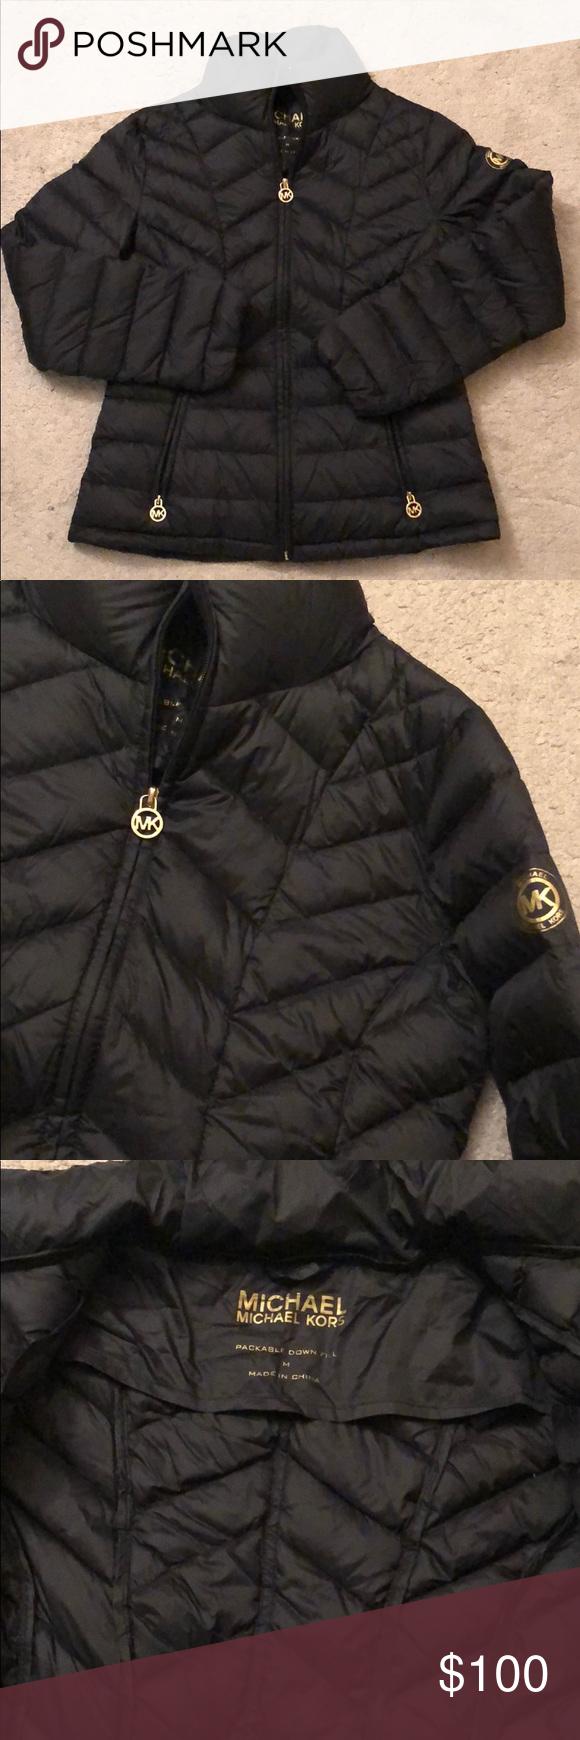 New Black Michael Kors Jacket Michael Kors Jackets New Black Clothes Design [ 1740 x 580 Pixel ]